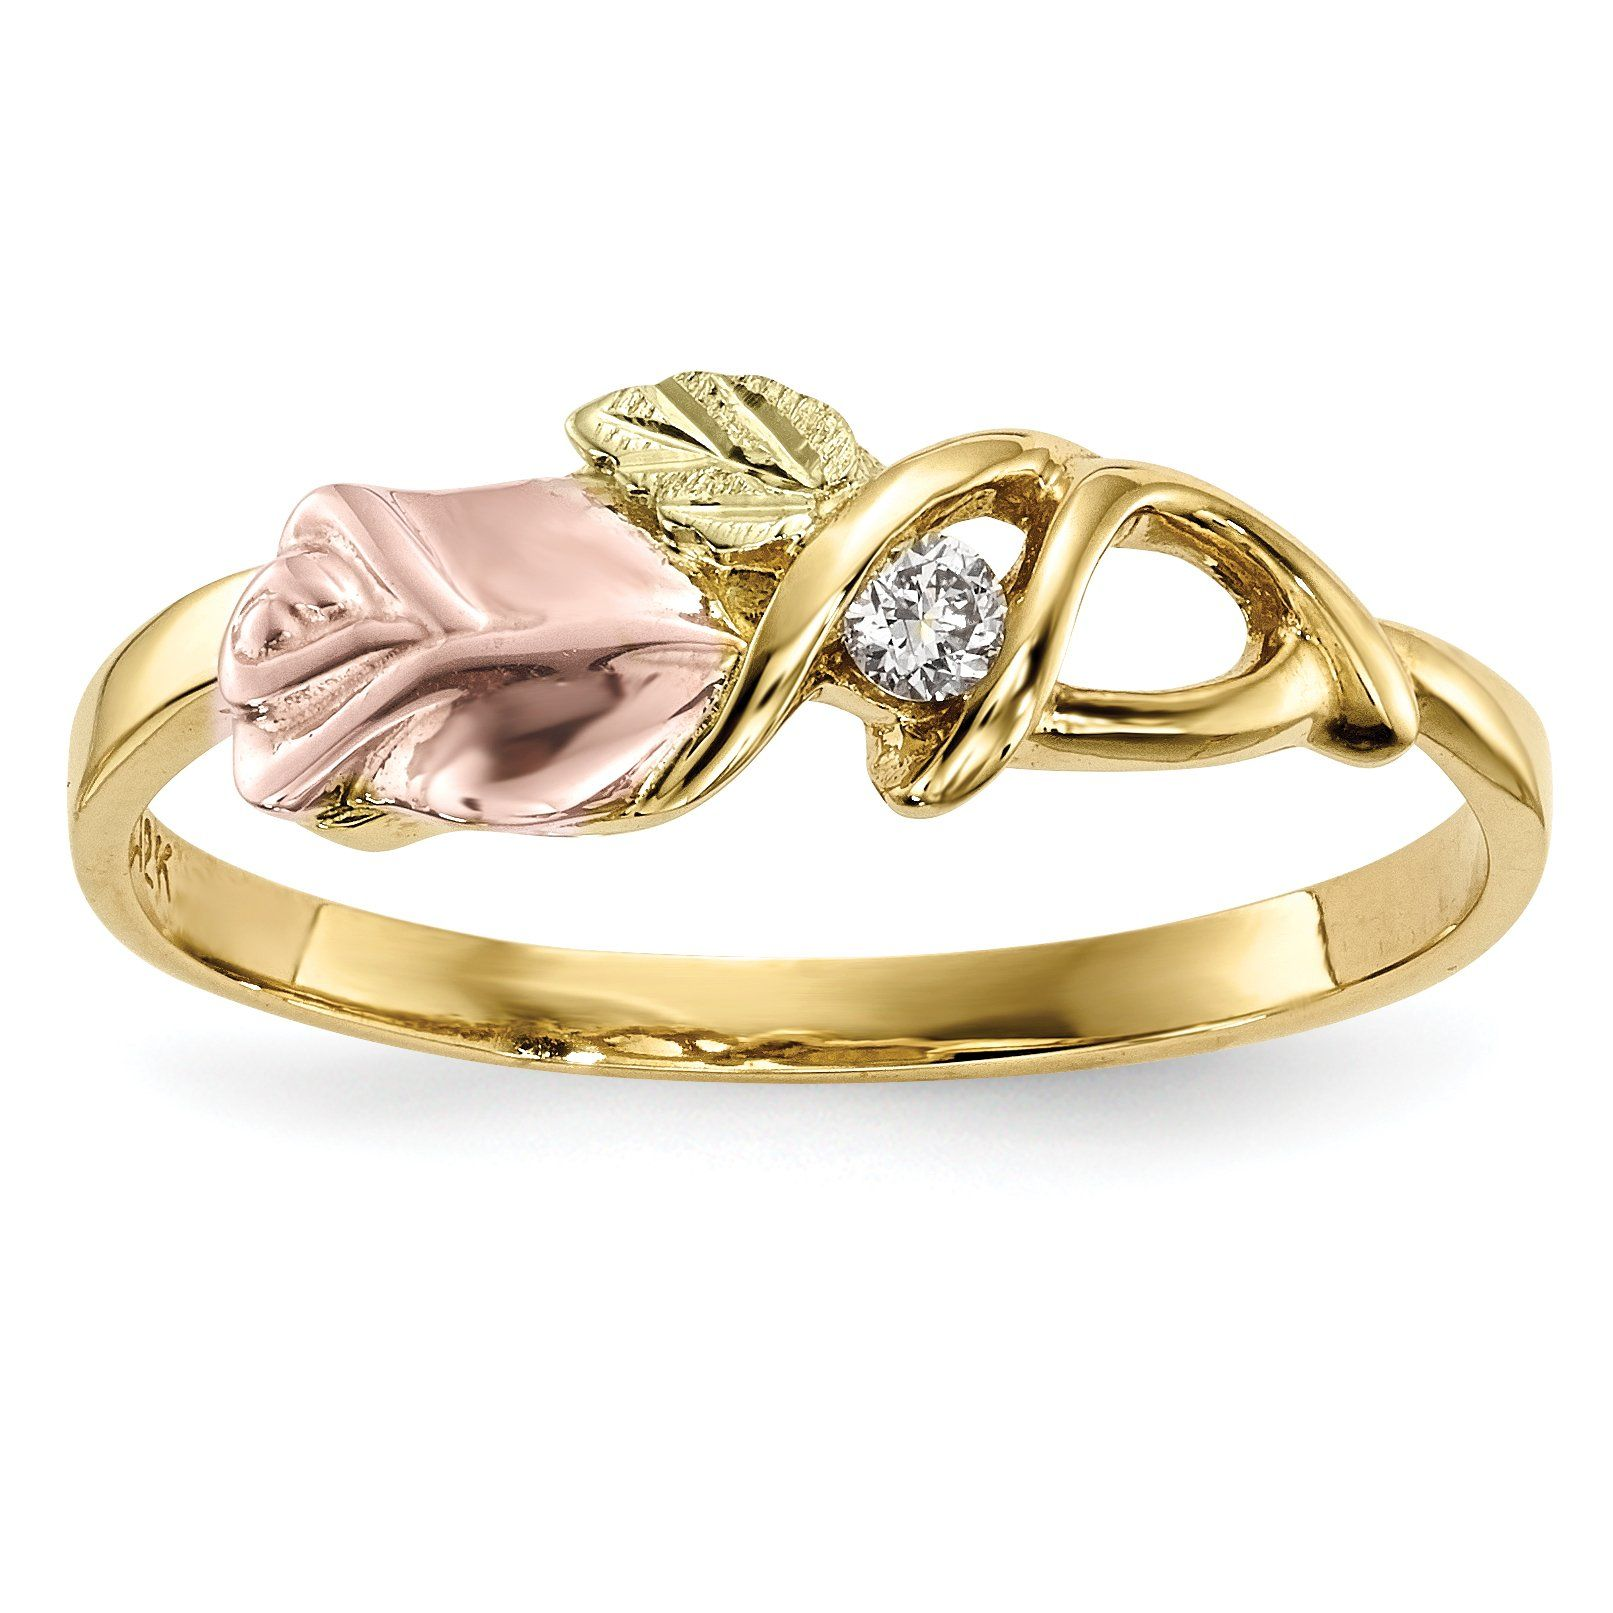 10K TriColor Black Hills Gold Diamond Ring 10K TriColor